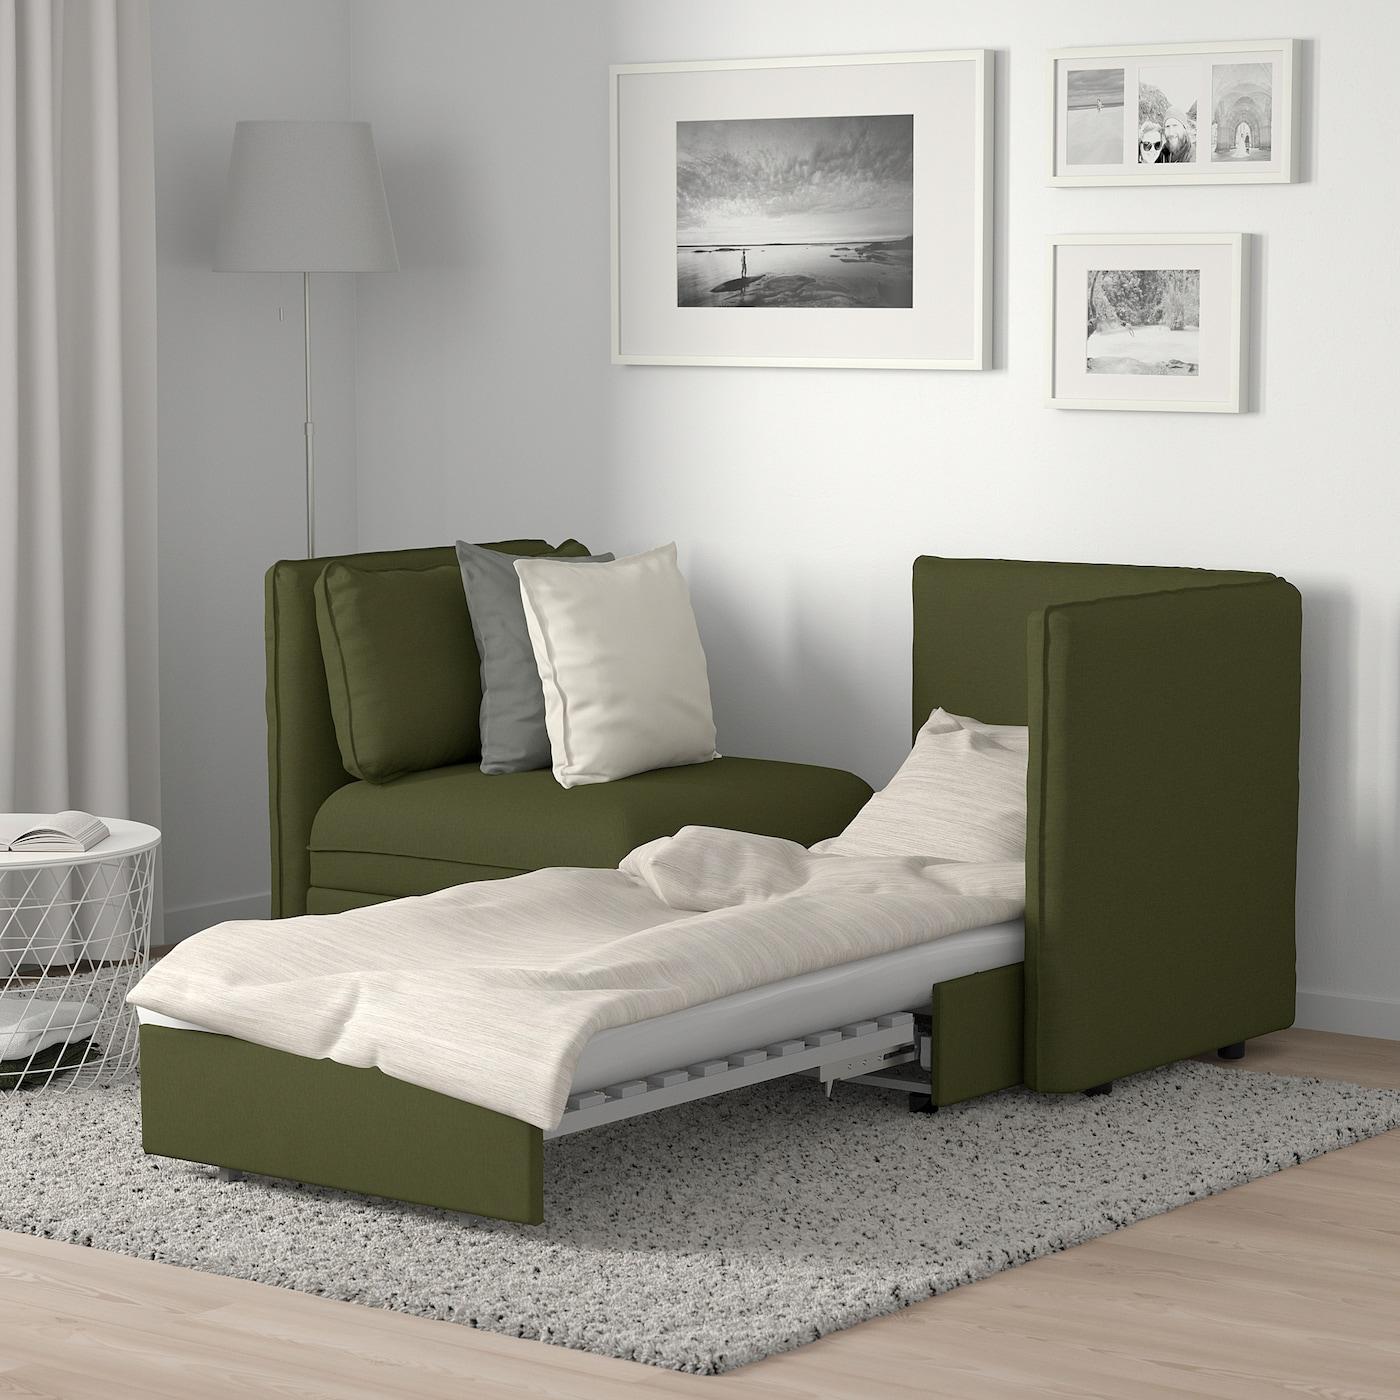 Vallentuna 2 Pers Modulopb Sofa Sovesofa Og Opbevaring Orrsta Olivengron Ikea